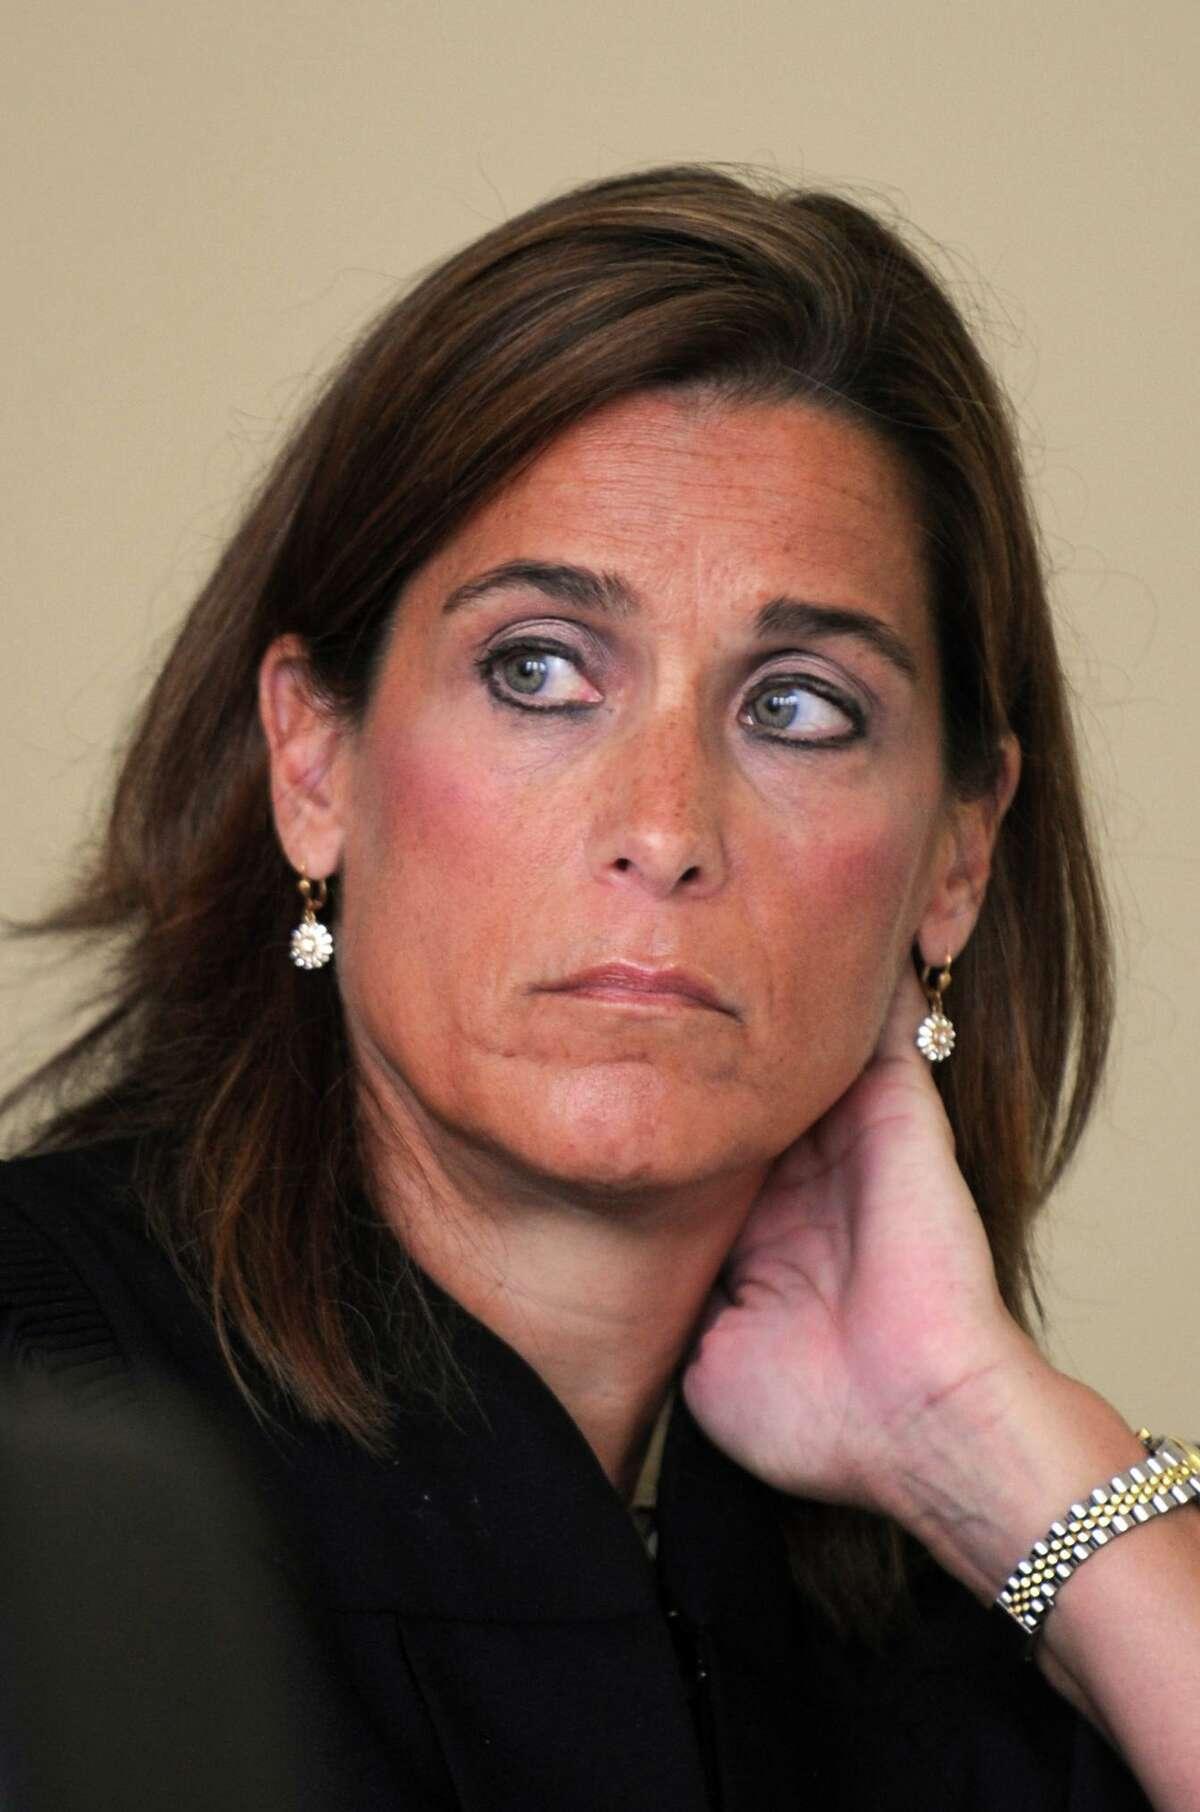 File photo. State Superior Court Judge Barbara Bellis.